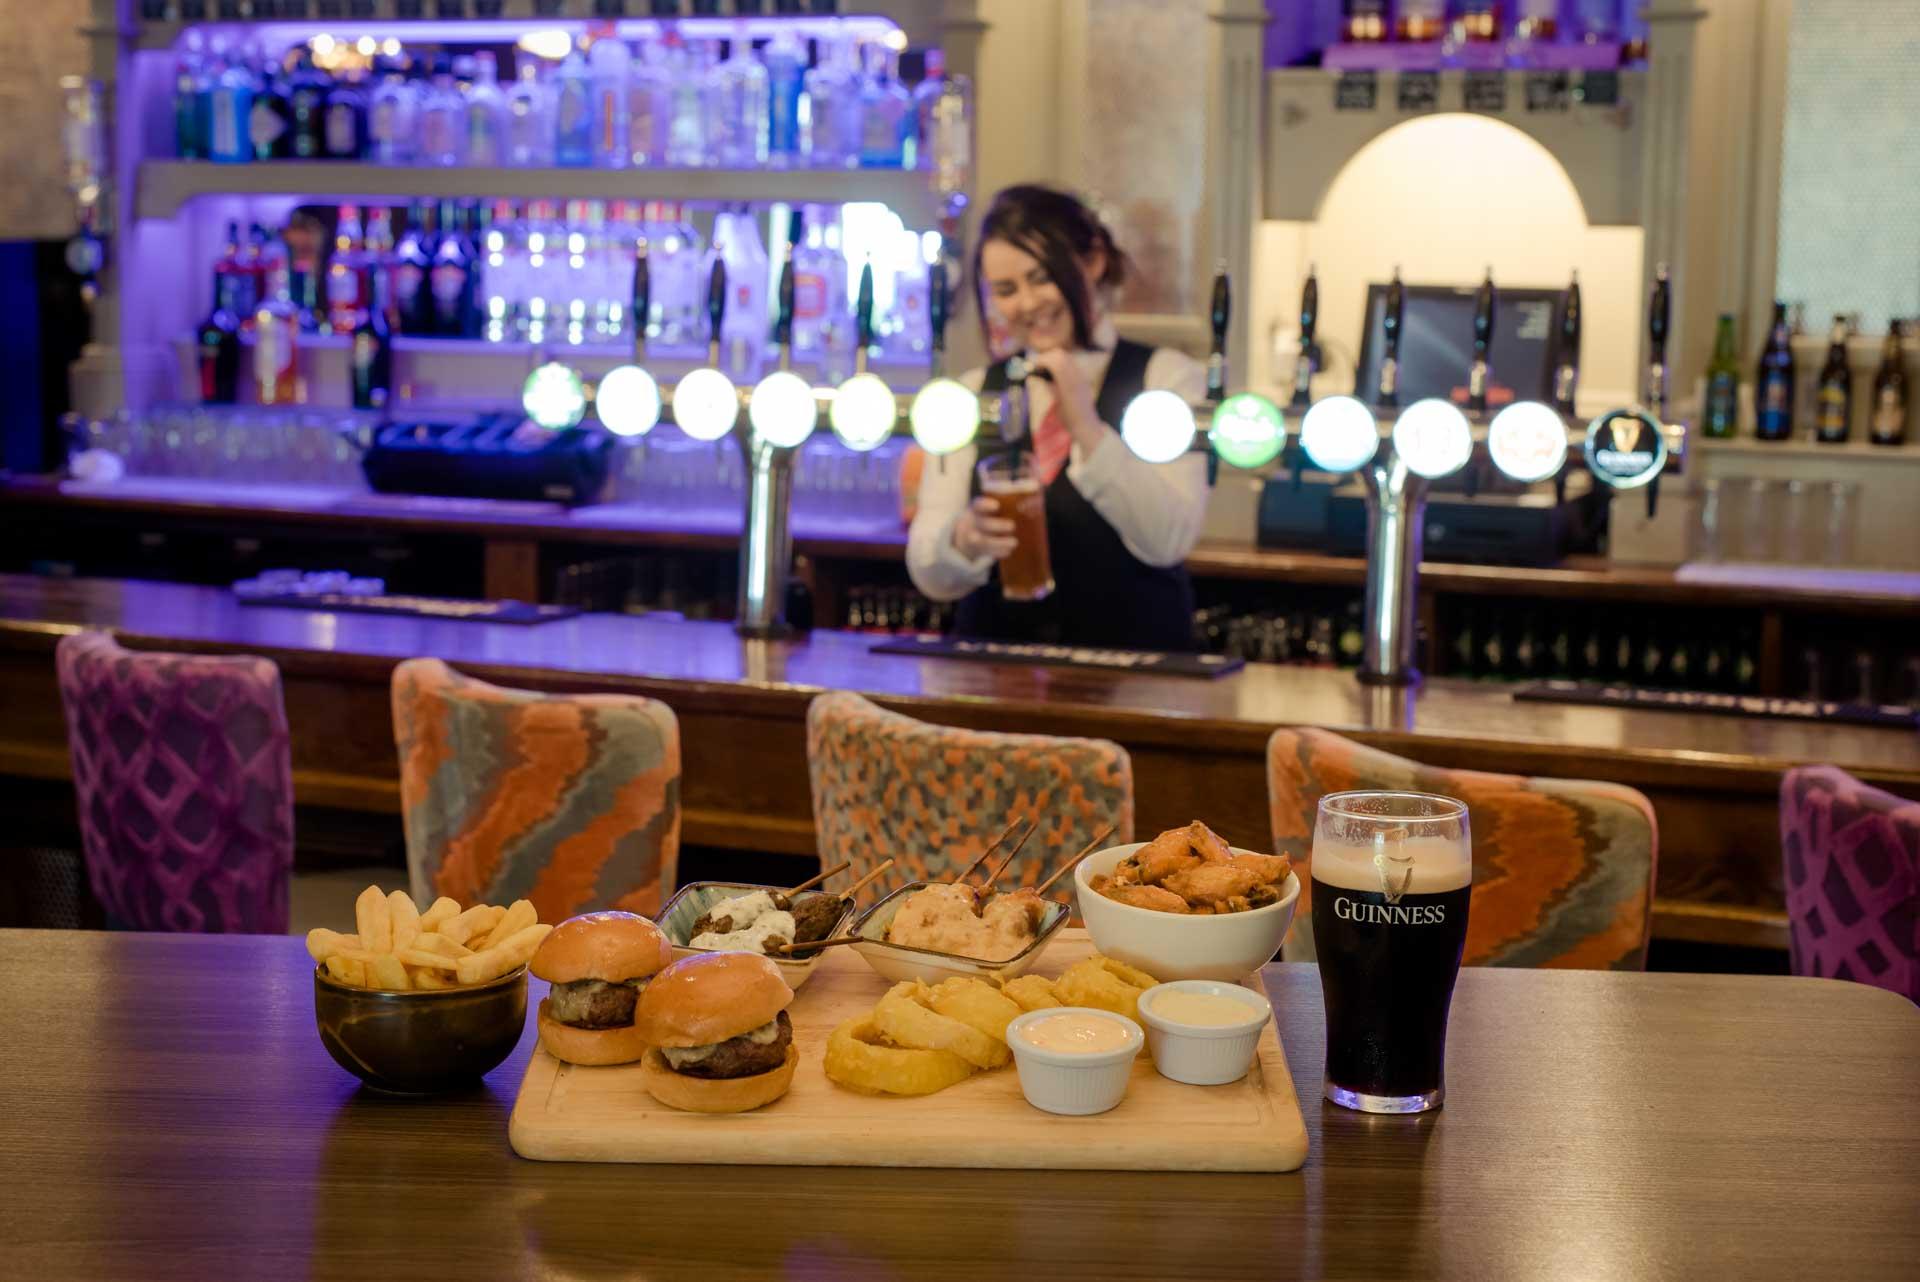 Woodford Dolmen Hotel Carlow Platter Food with Bartender